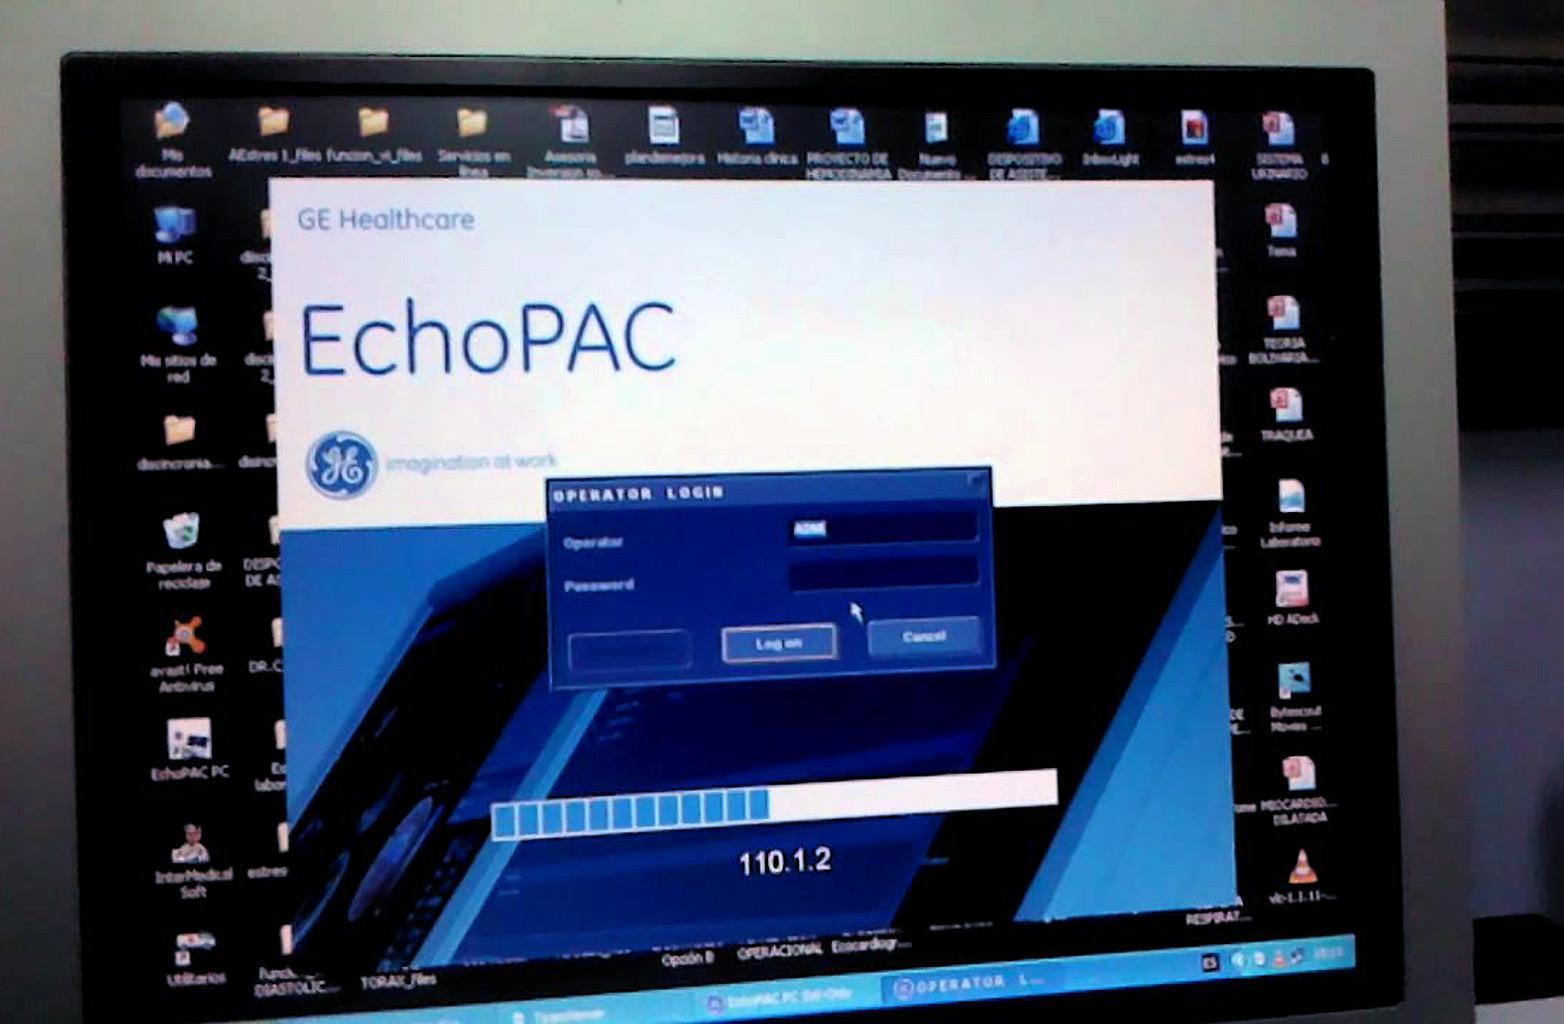 EchoPAC PC Software   Medist Imaging